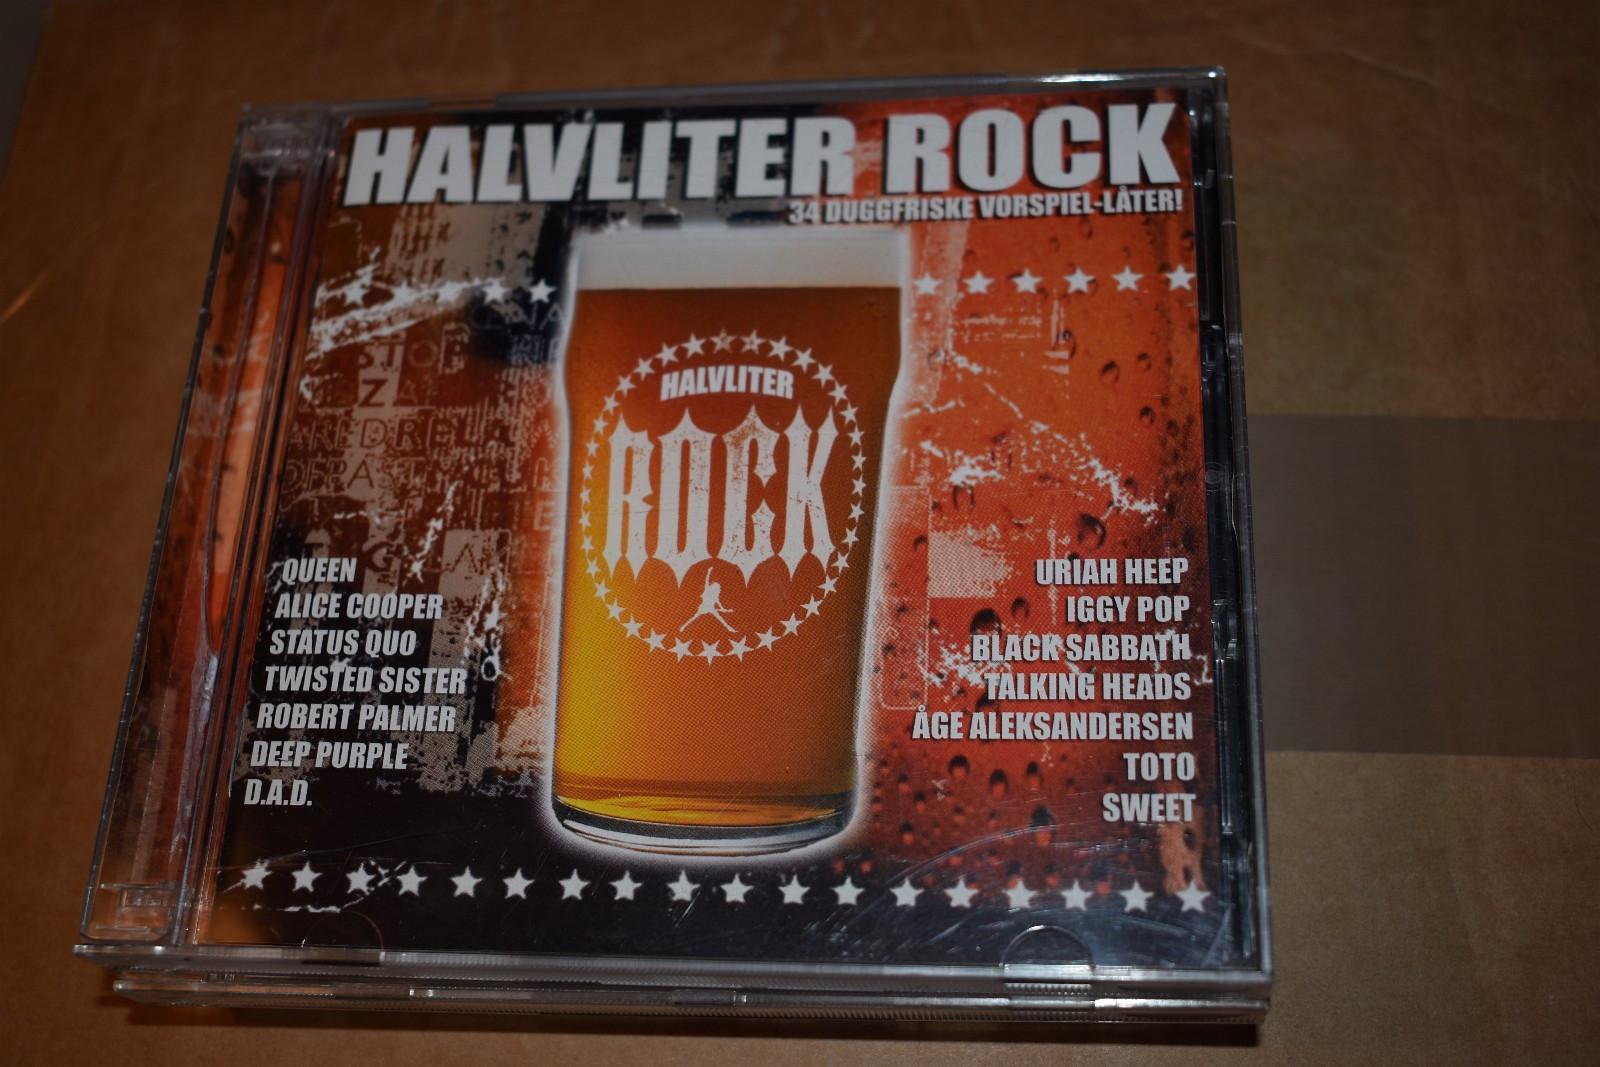 Halvliter Rock - Leknes  - Dobbel CD Halvliter Rock - samlet de beste låtene.   EX-/EX-  h.b.o. kr. 55,- - Leknes